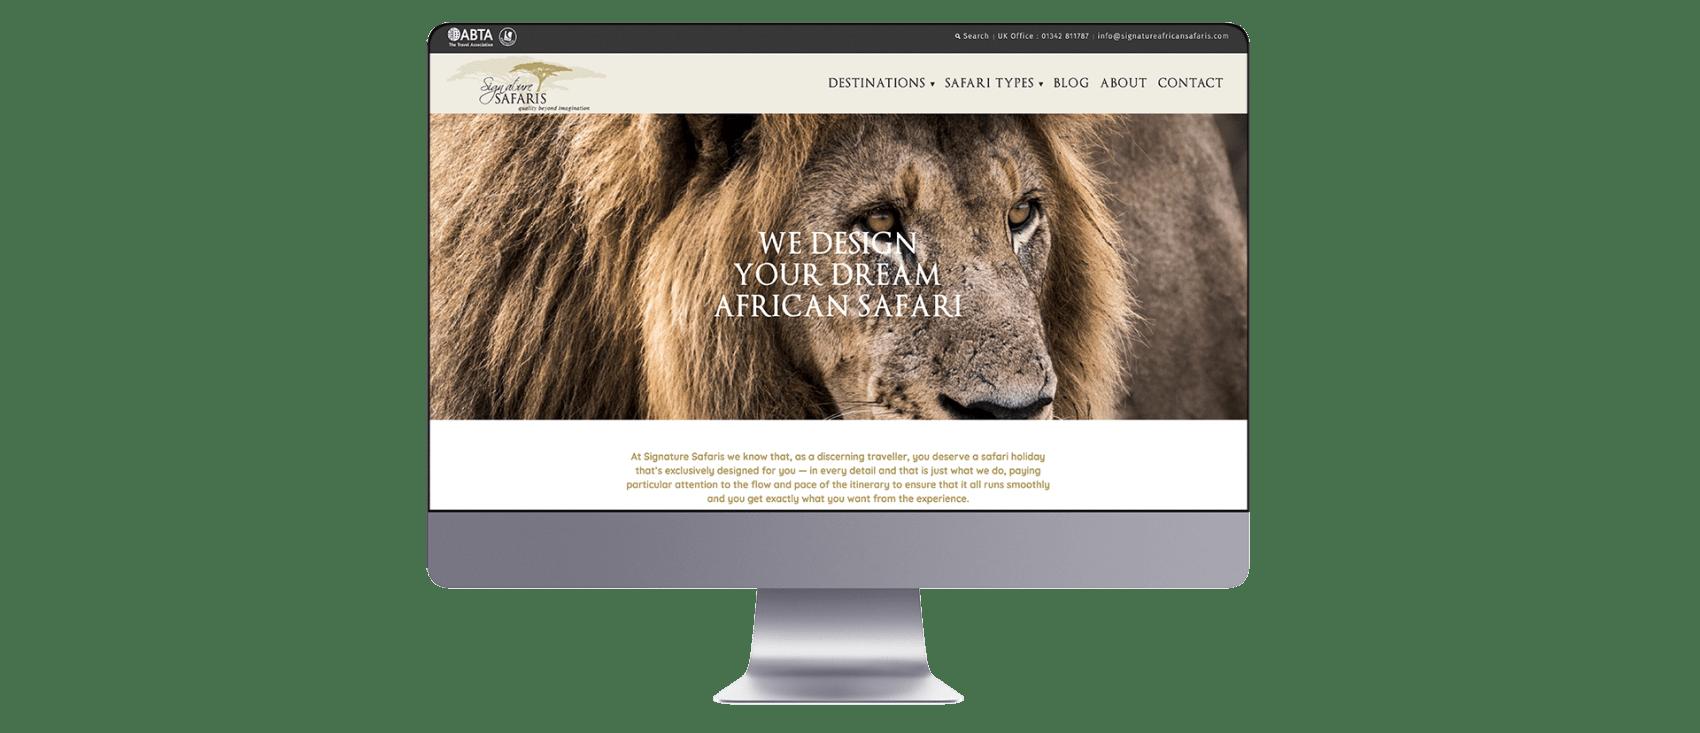 Signature safaris website design on Mac